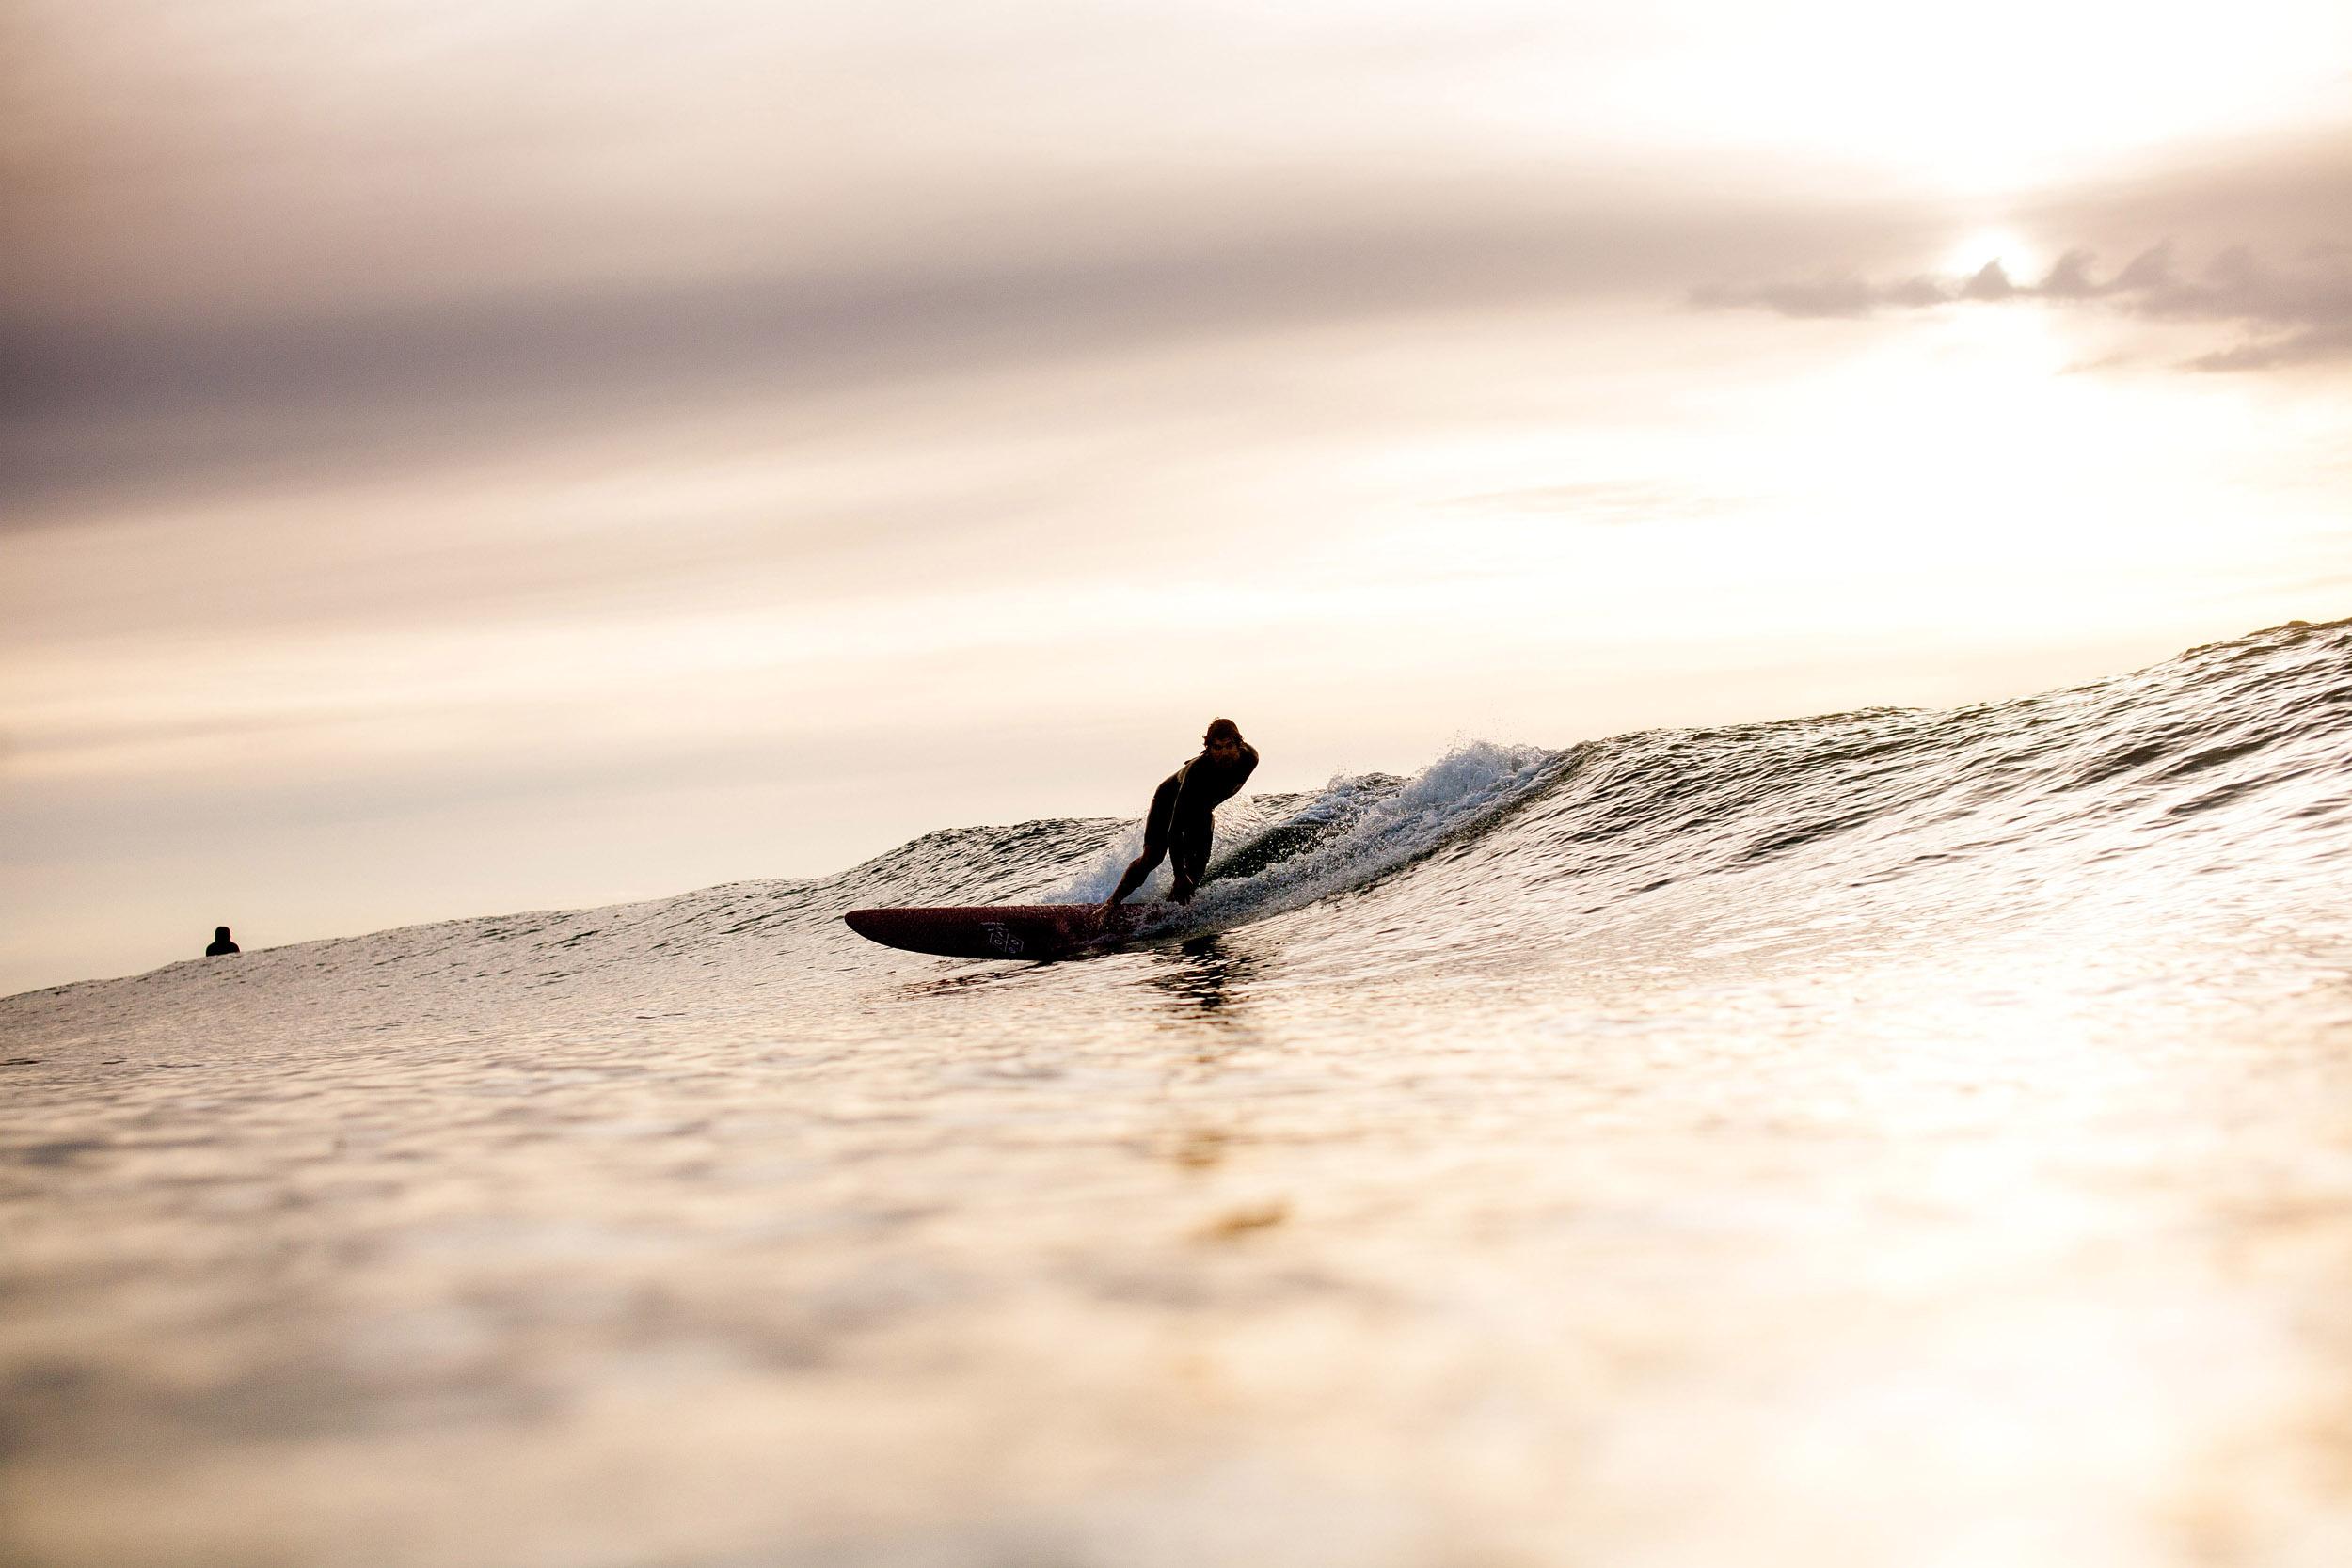 longboarding-soul-surflifestyle-S1353-401.jpg